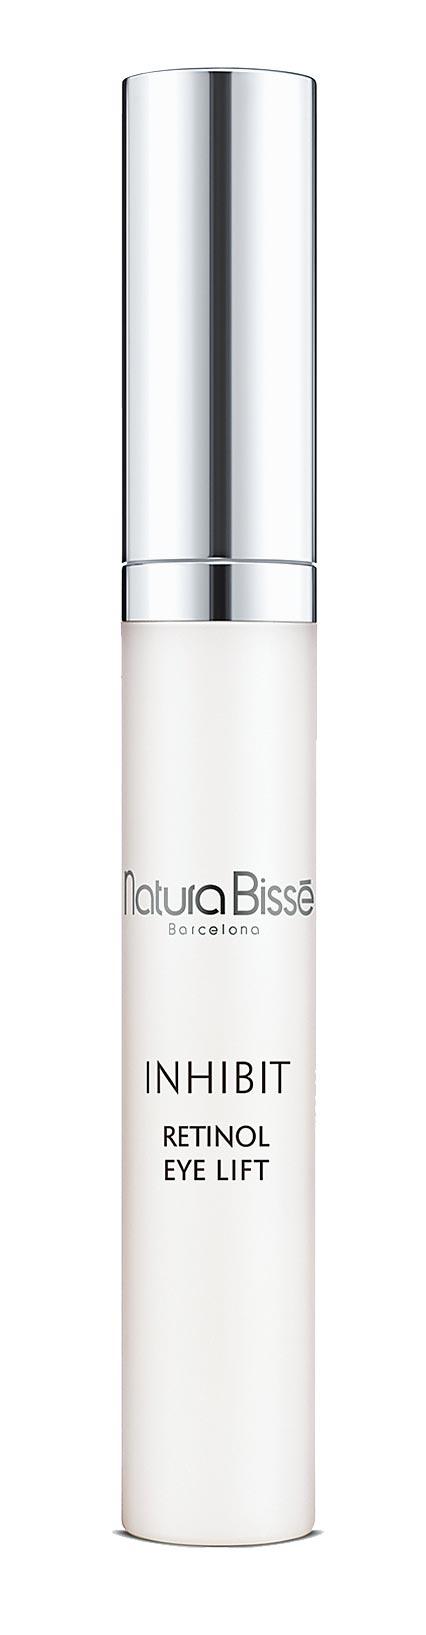 Natura Bisse 6D立體緊緻拉提眼霜15ml,5800元。(Natura Bisse 提供)